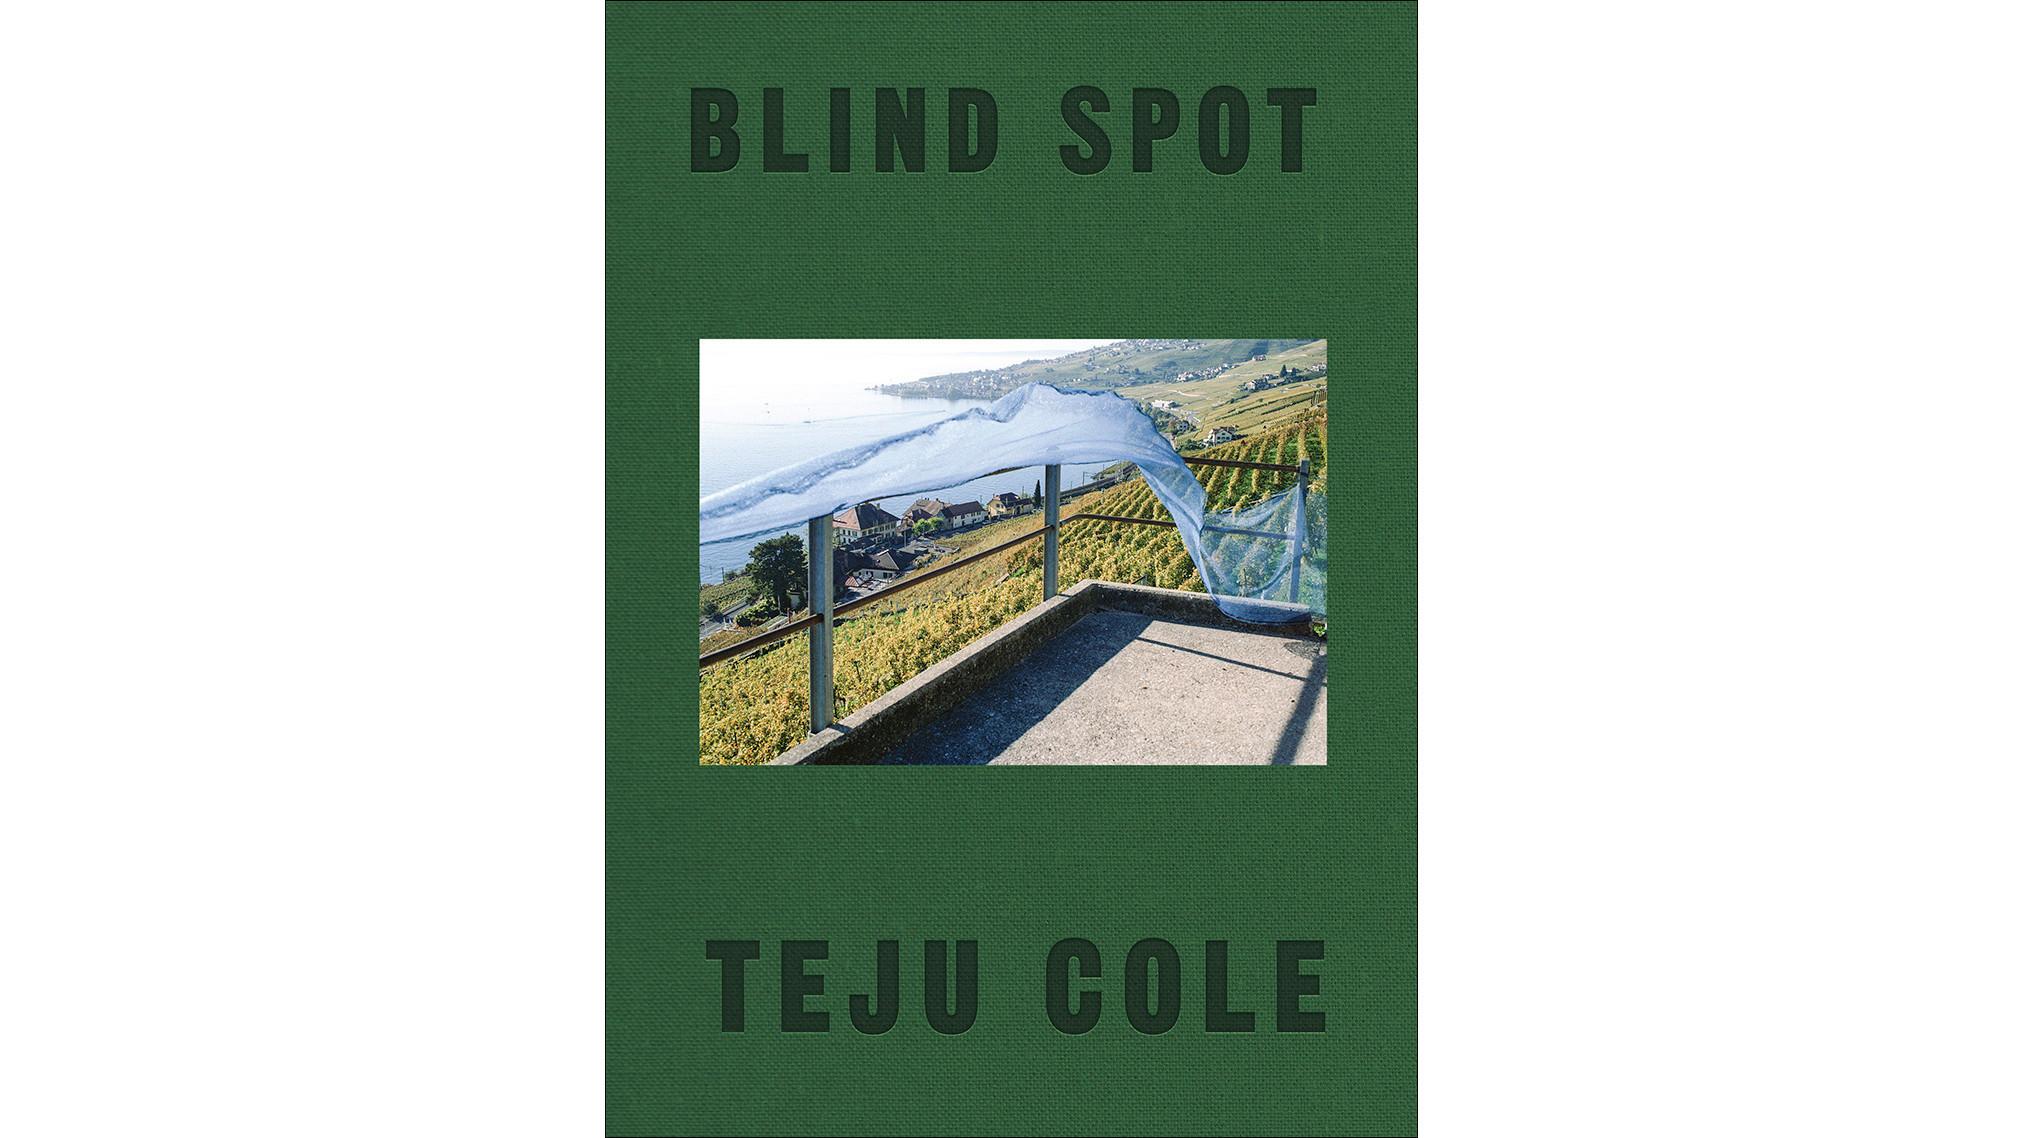 """Blind Spot"" by Teju Cole"